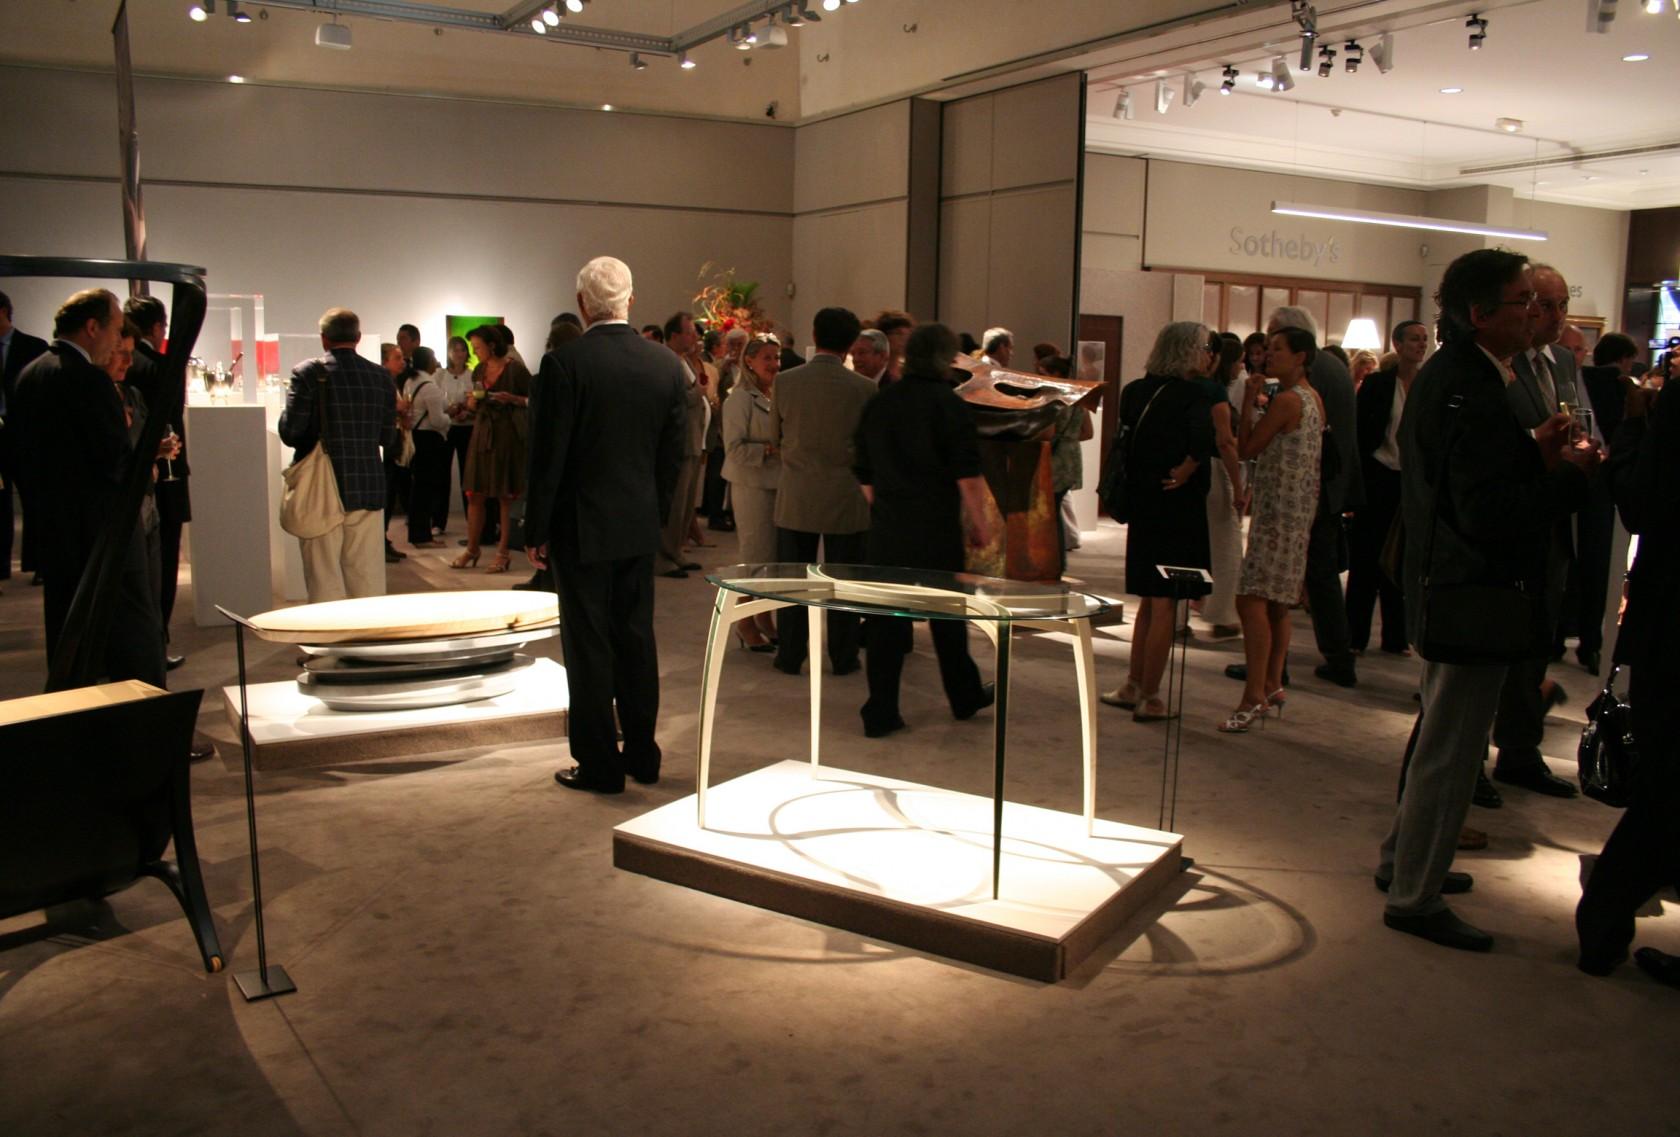 fondation bettencourt schueller ludovic avenel b niste cr ateur paris. Black Bedroom Furniture Sets. Home Design Ideas